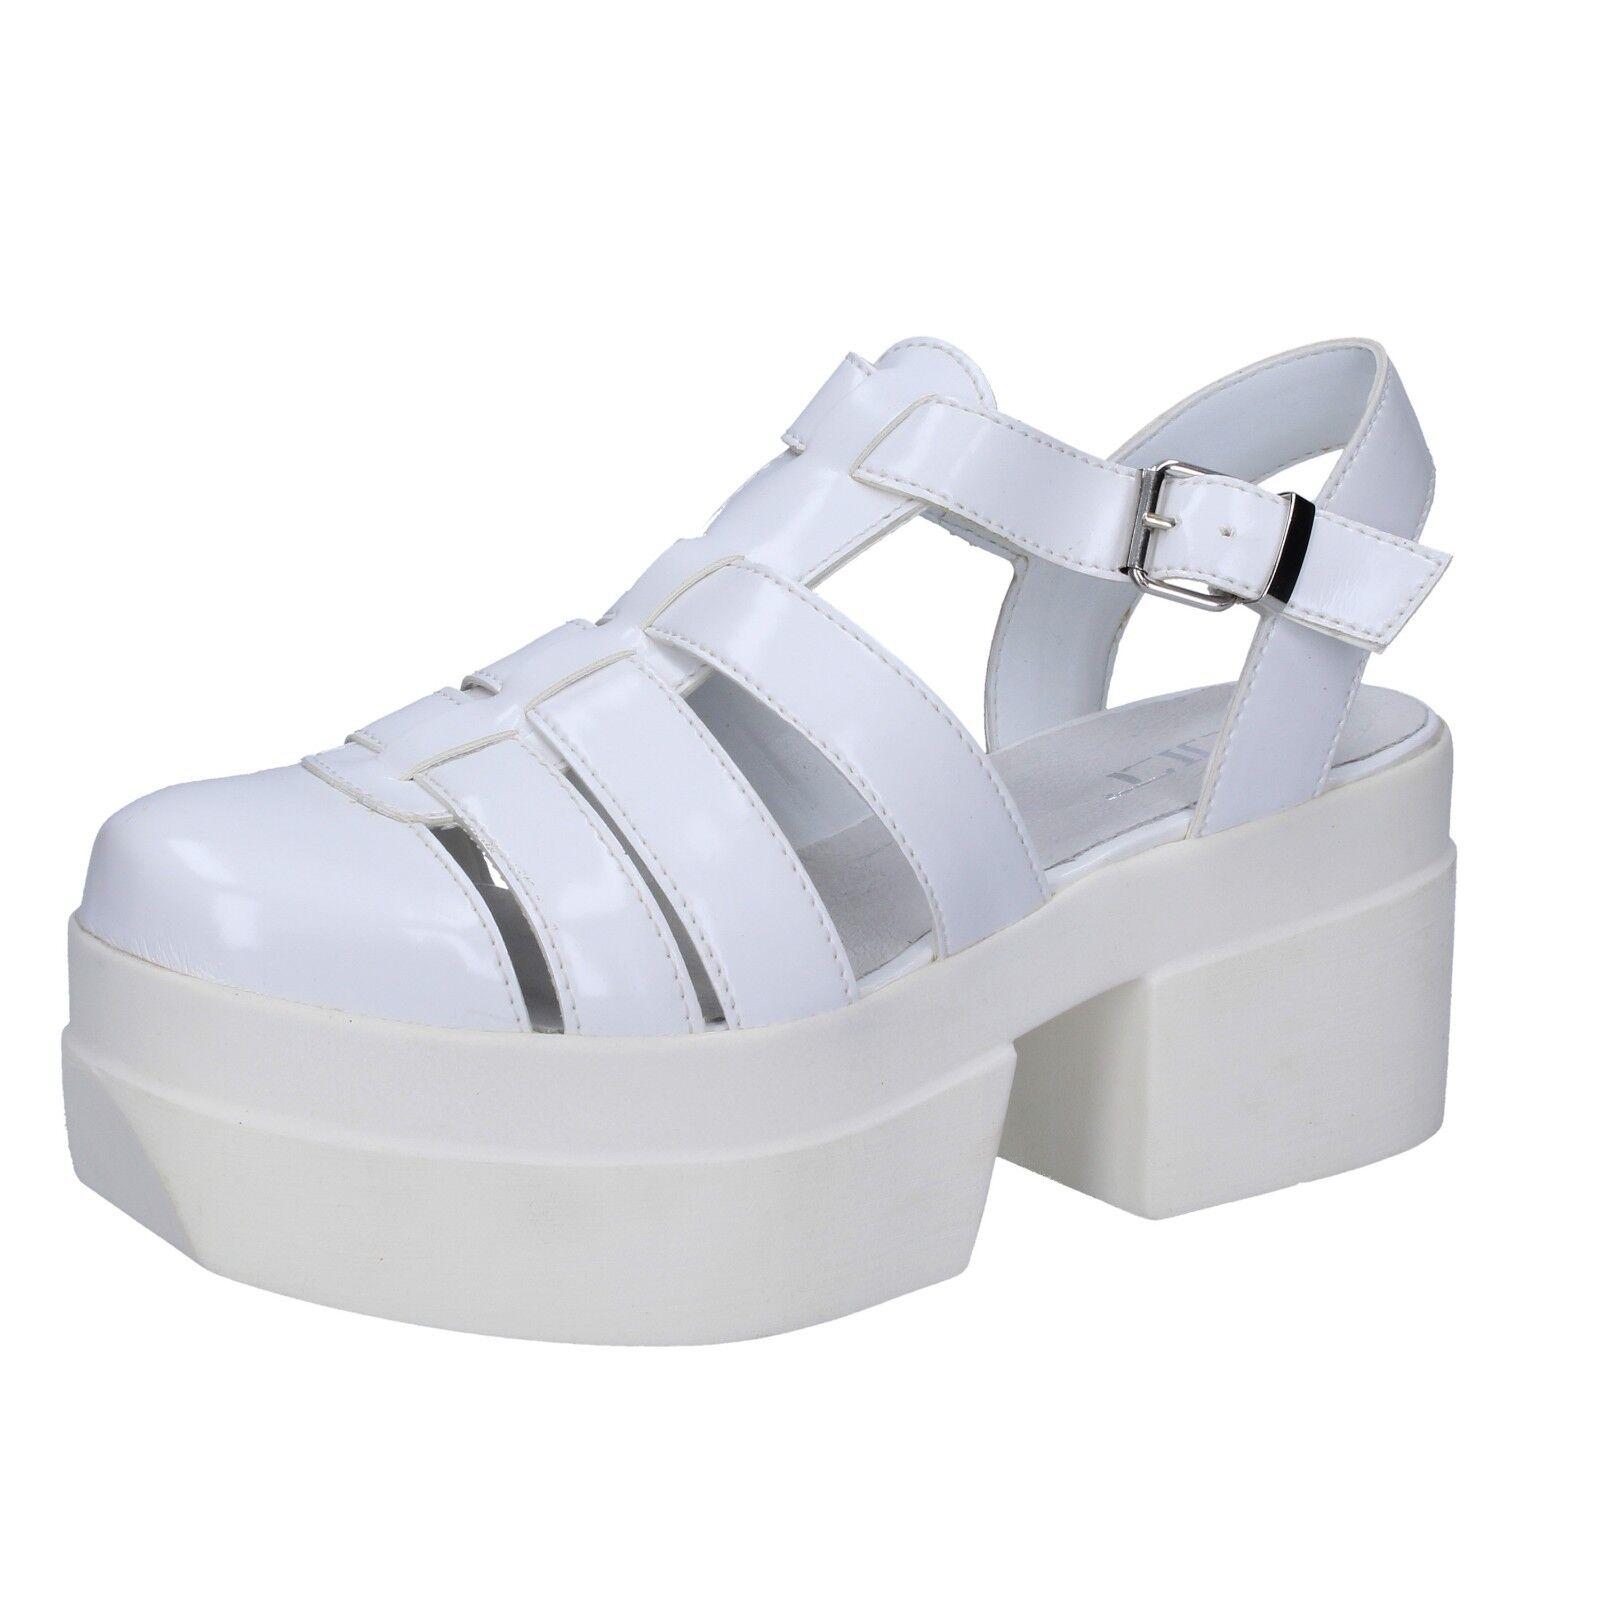 Scarpe donna CULT 40 EU sandali bianco pelle BT539-40 | Design Accattivante  | Uomini/Donne Scarpa